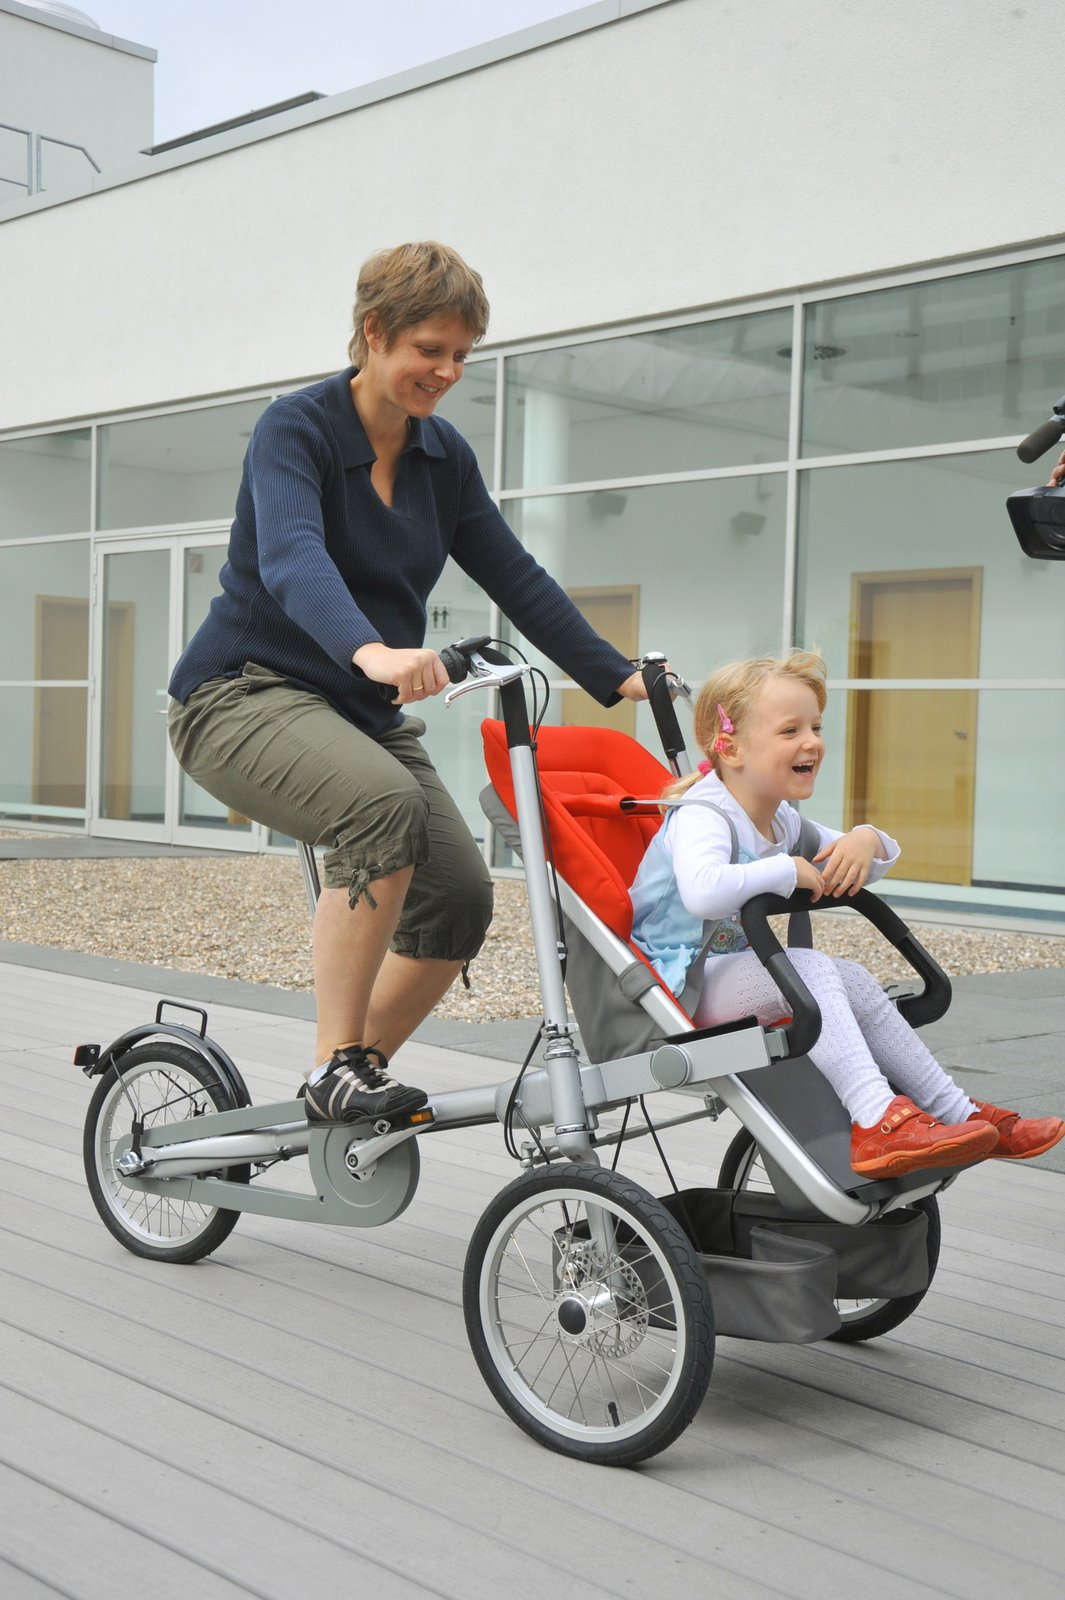 Taga Convertible Bike Stroller | Bluebadgerbaby's Blog